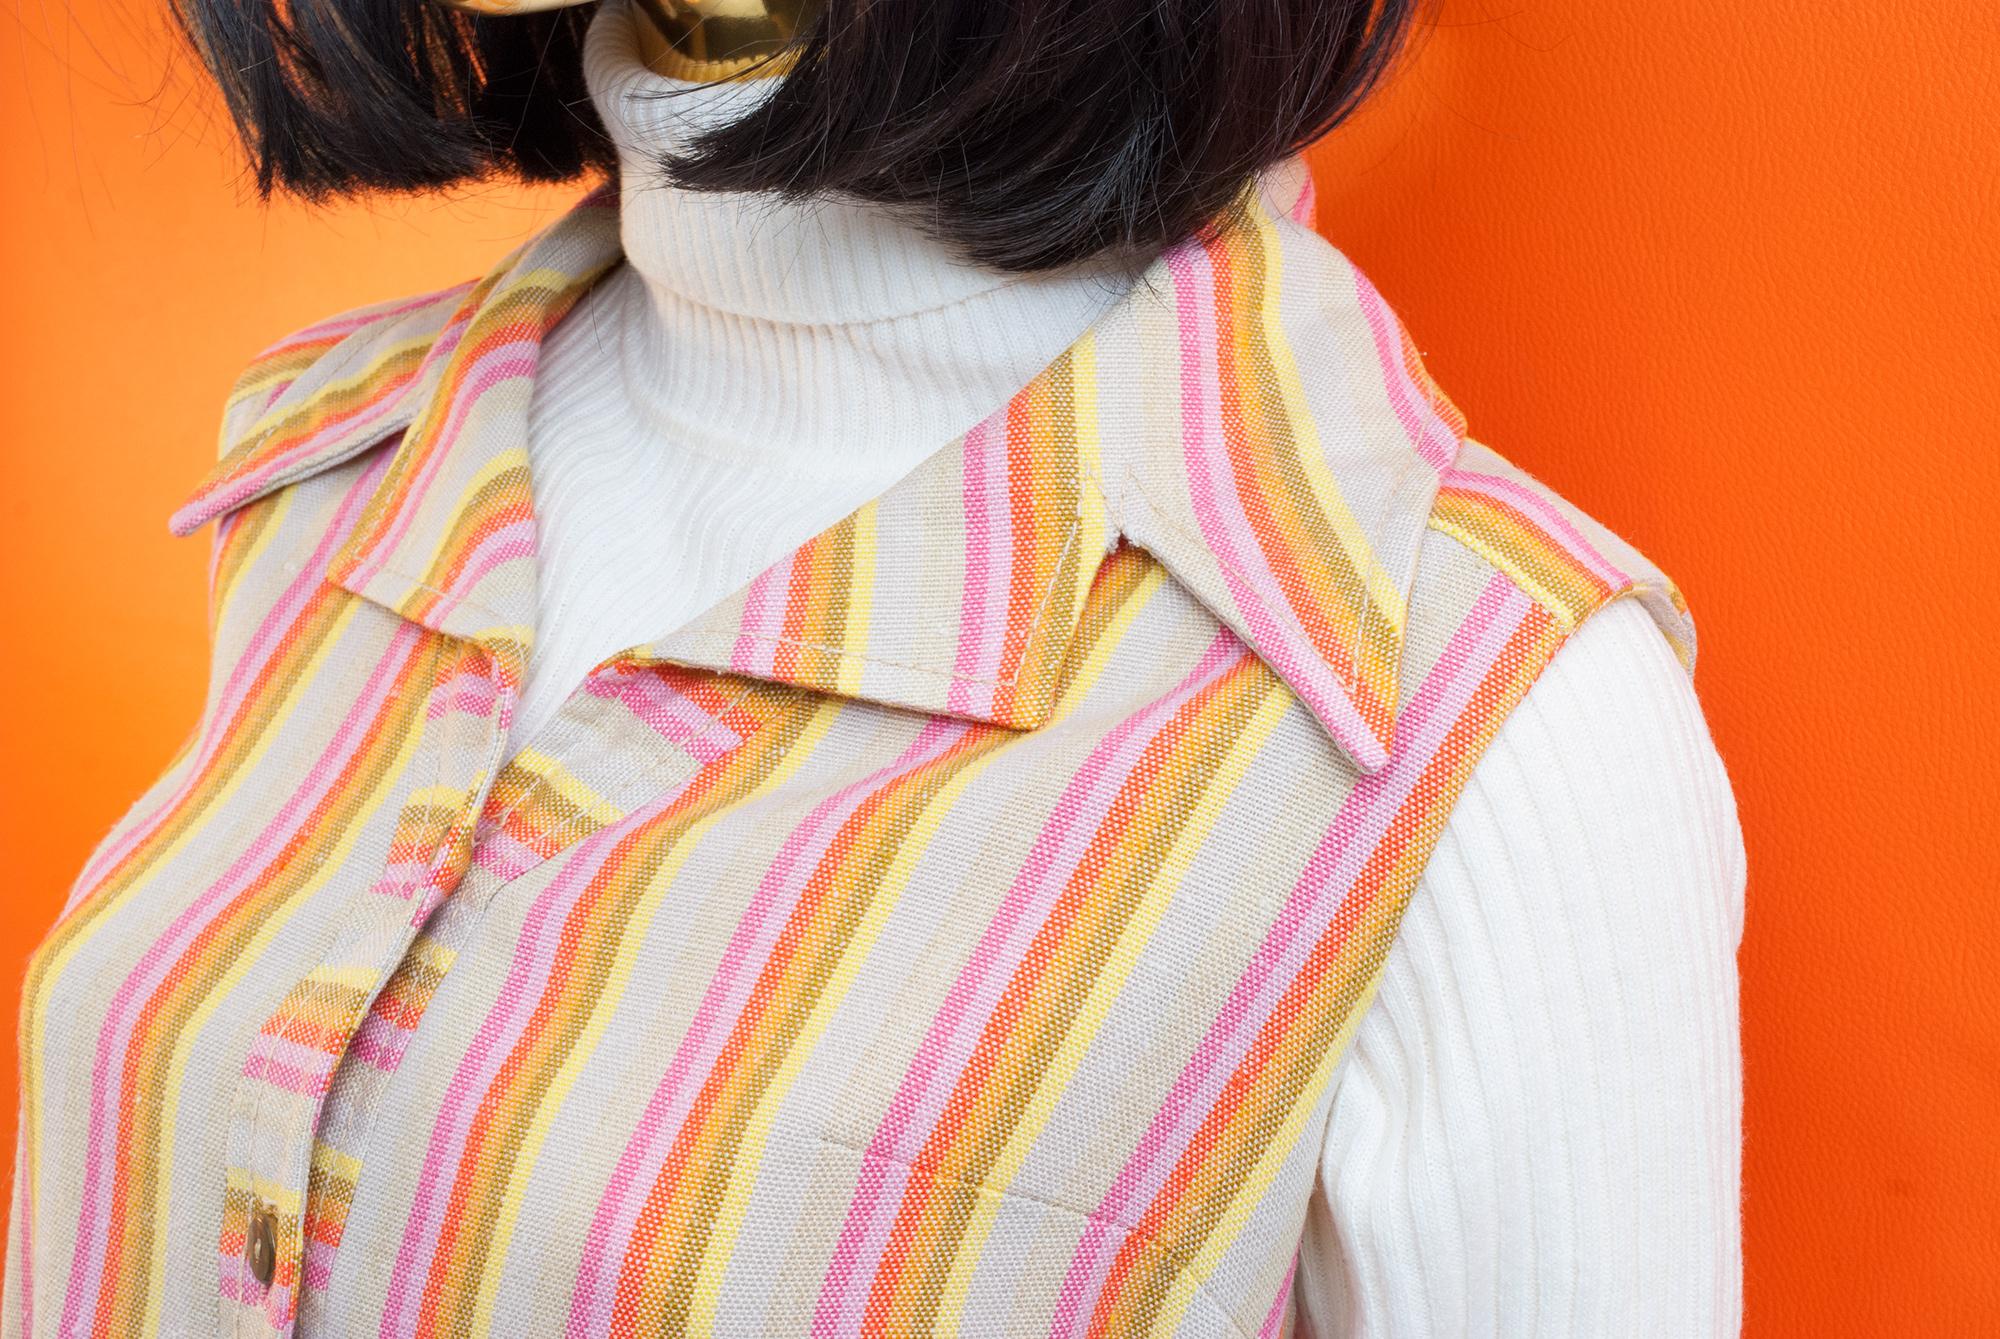 60's/70's Candy Stripe Dress